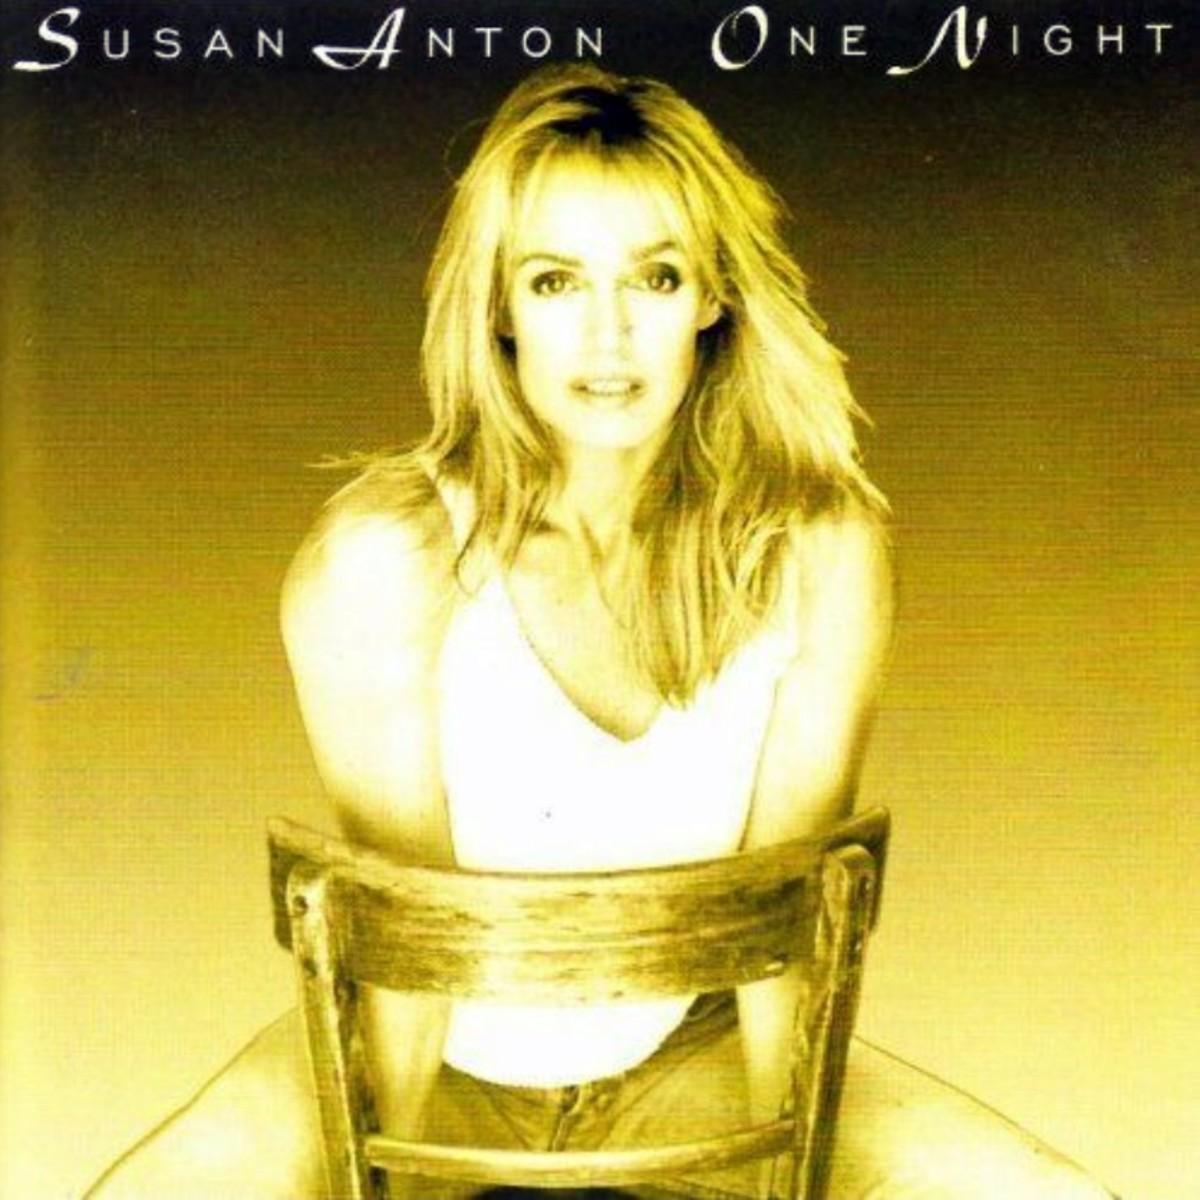 One Night CD